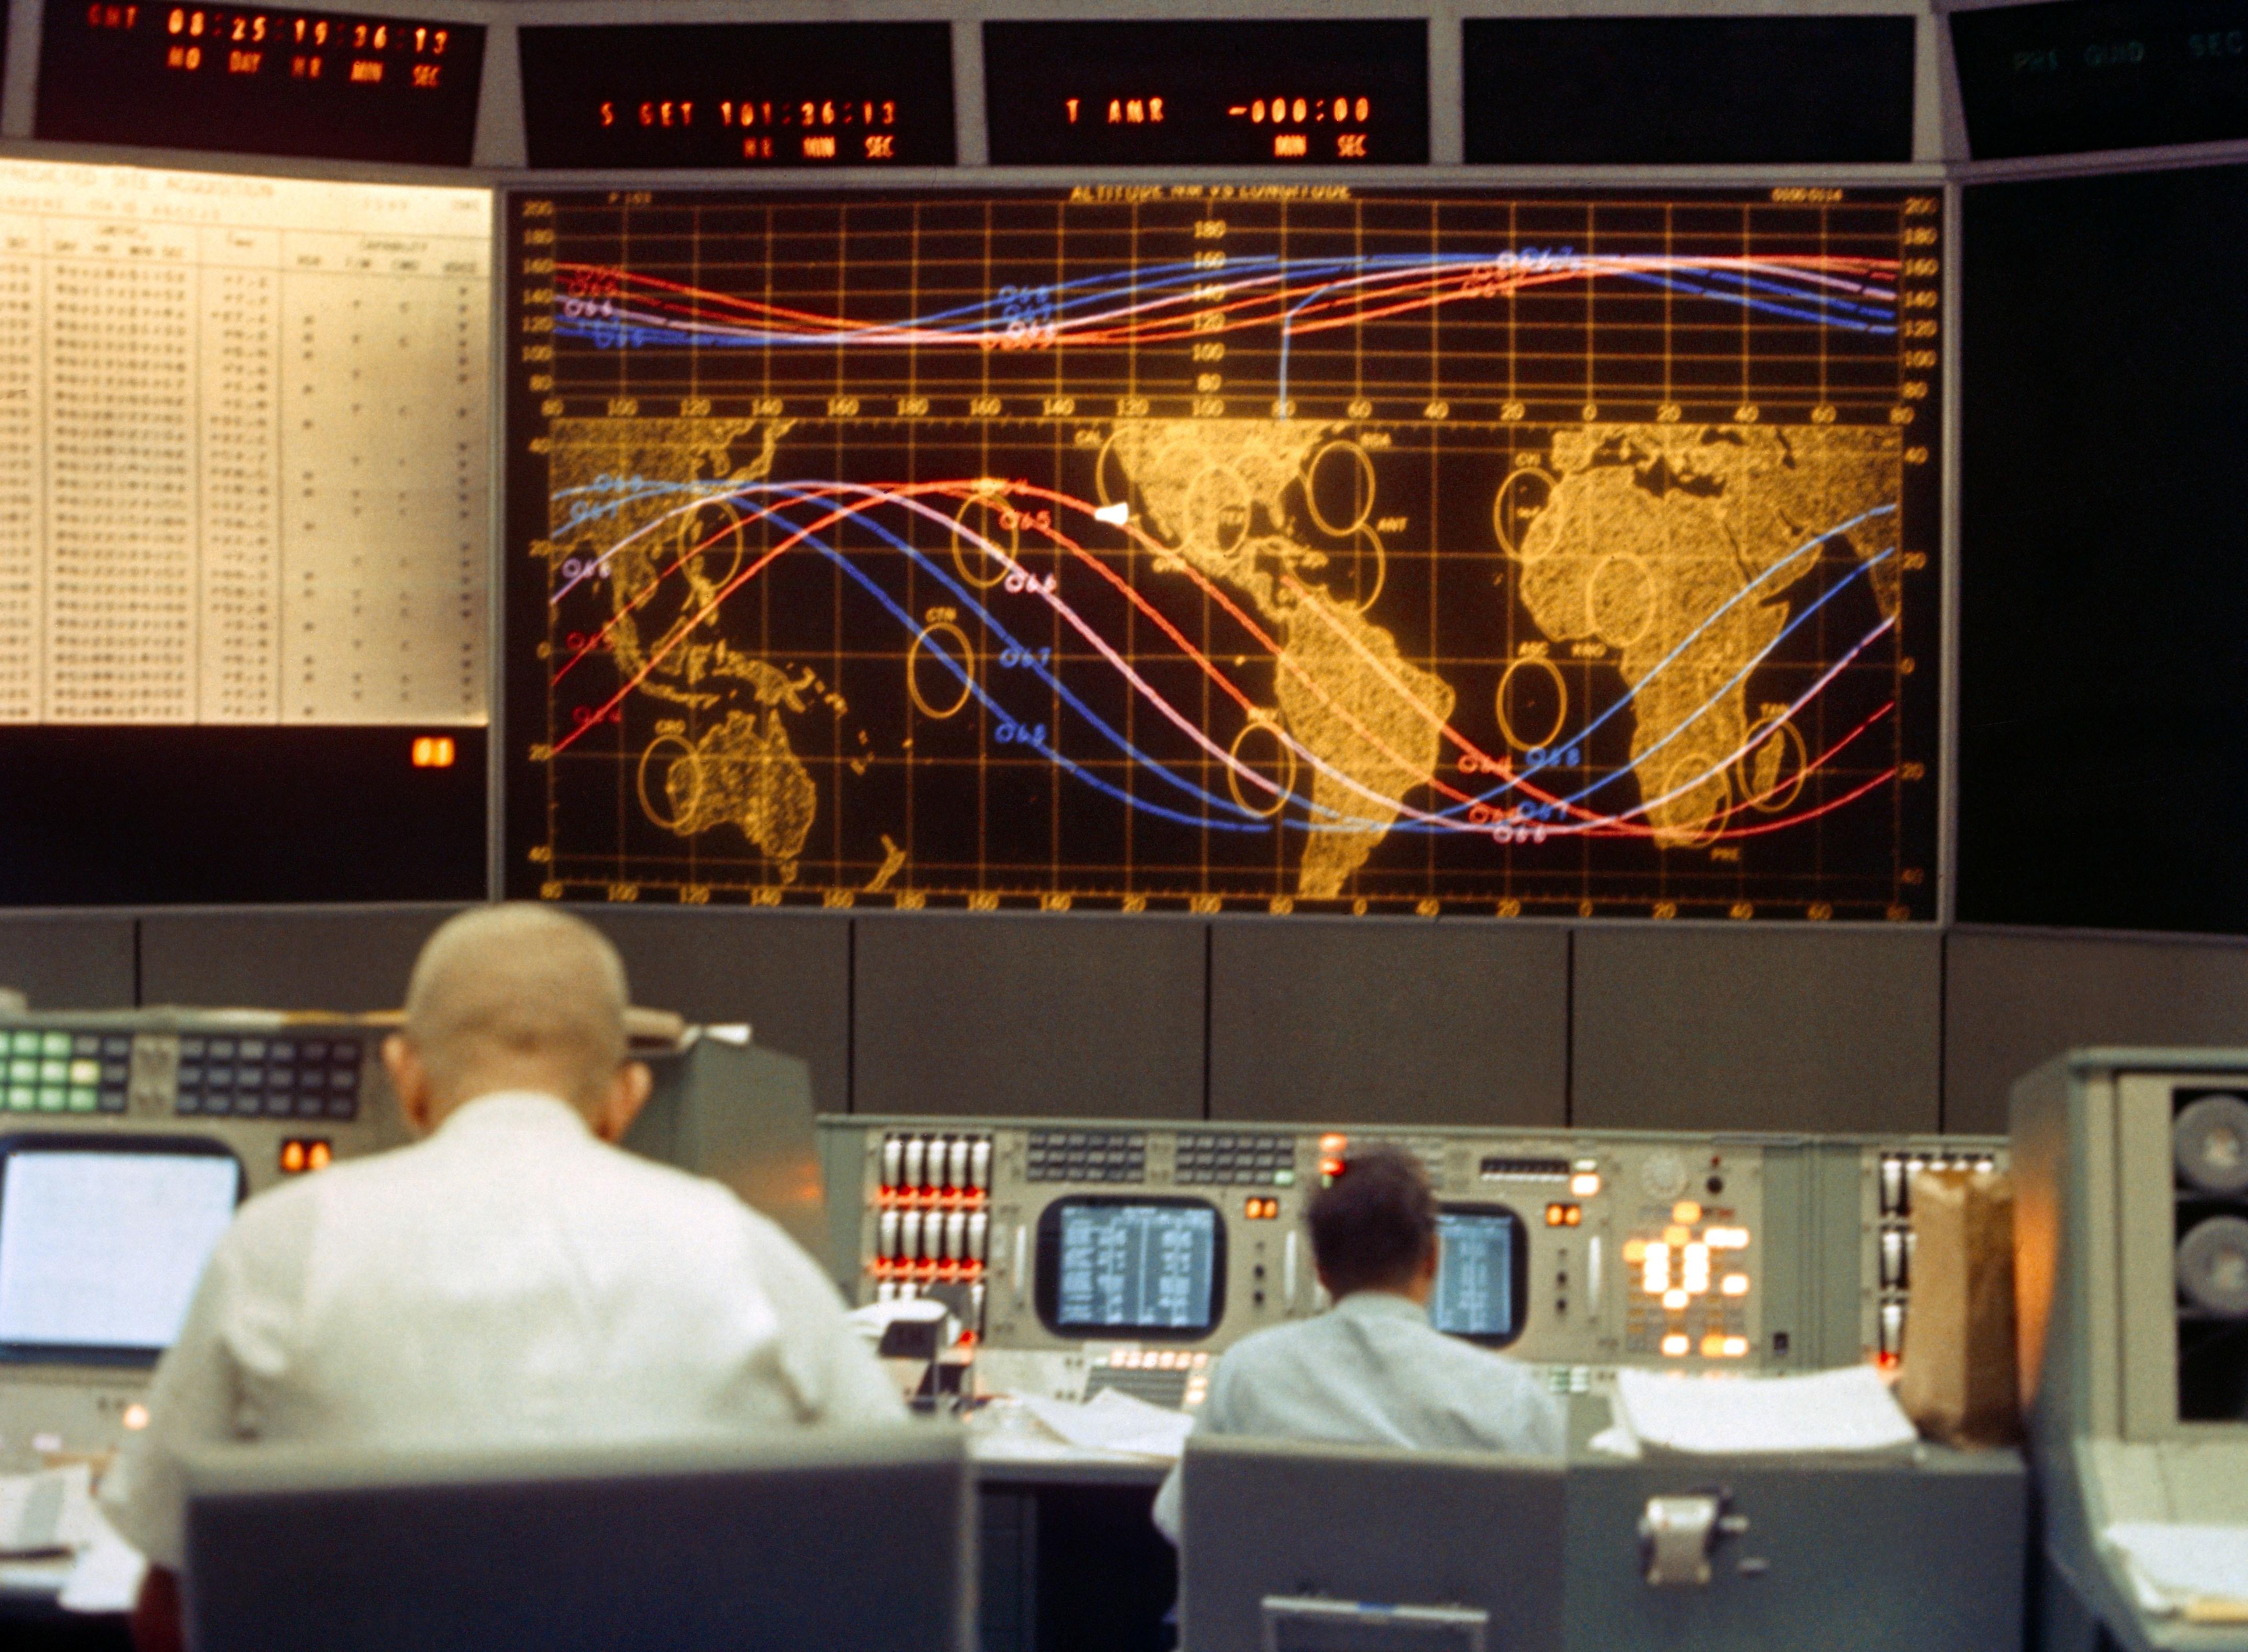 Gemini_5_control_room.jpg